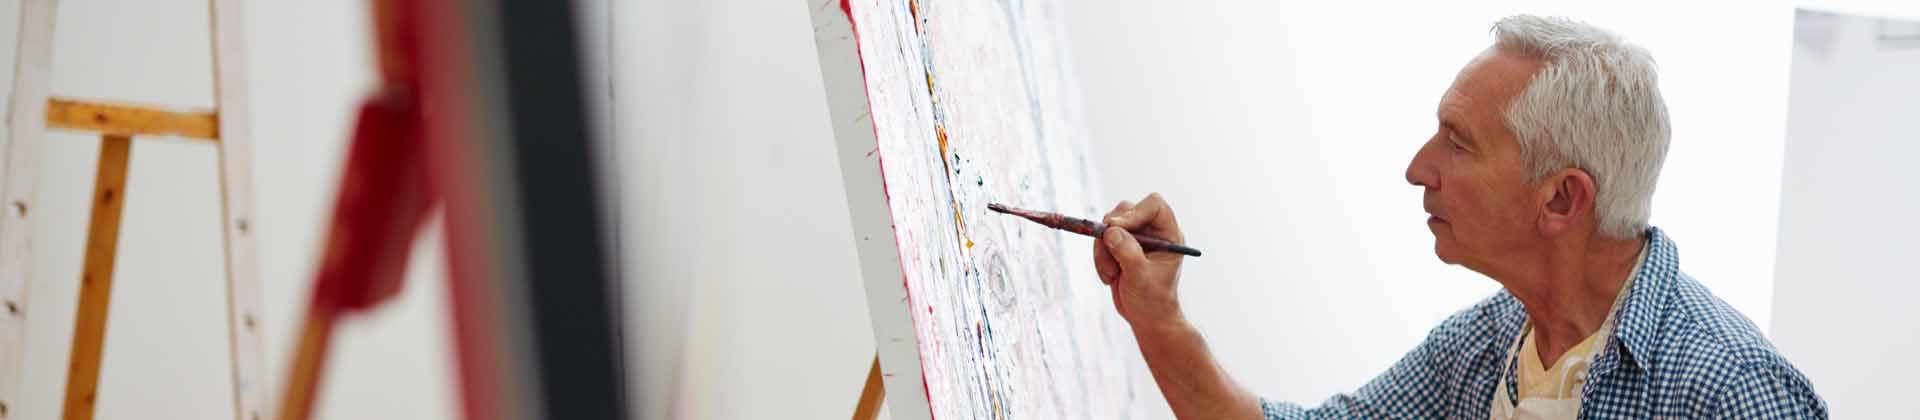 A senior man painting a large canvas